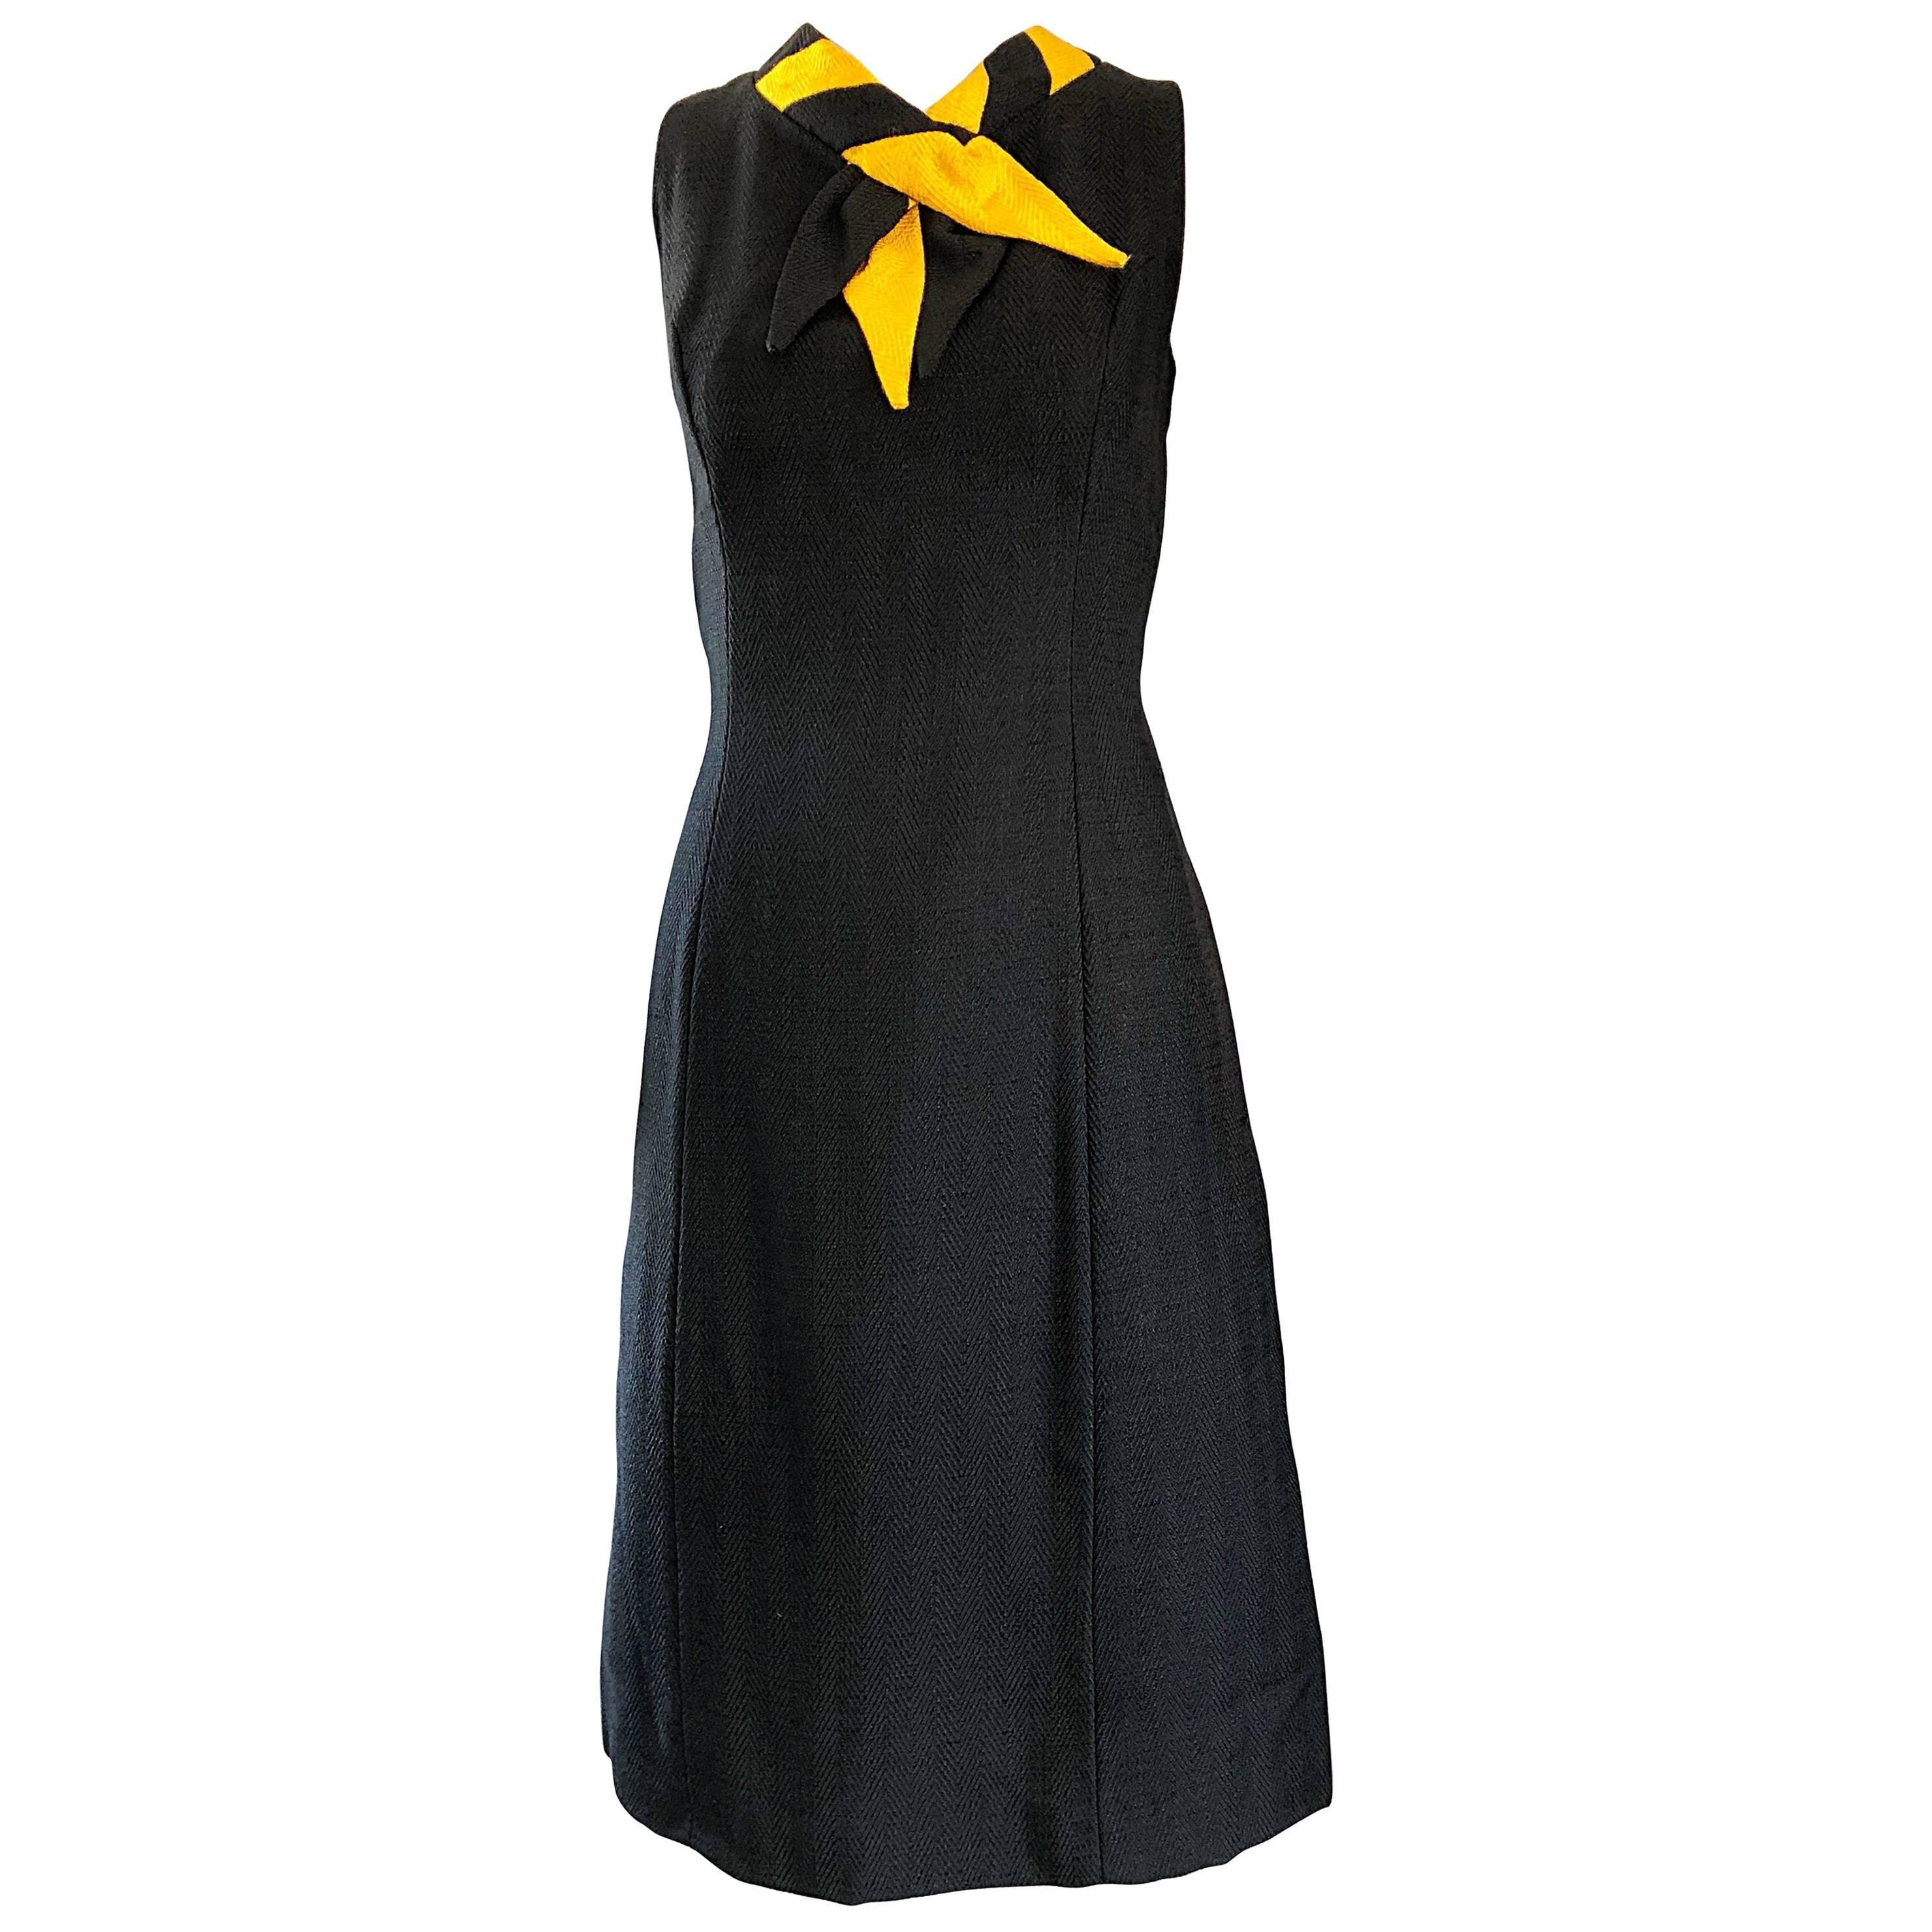 Chic 1960s Joseph Magnin Black and Yellow Vintage 60s Shift Dress